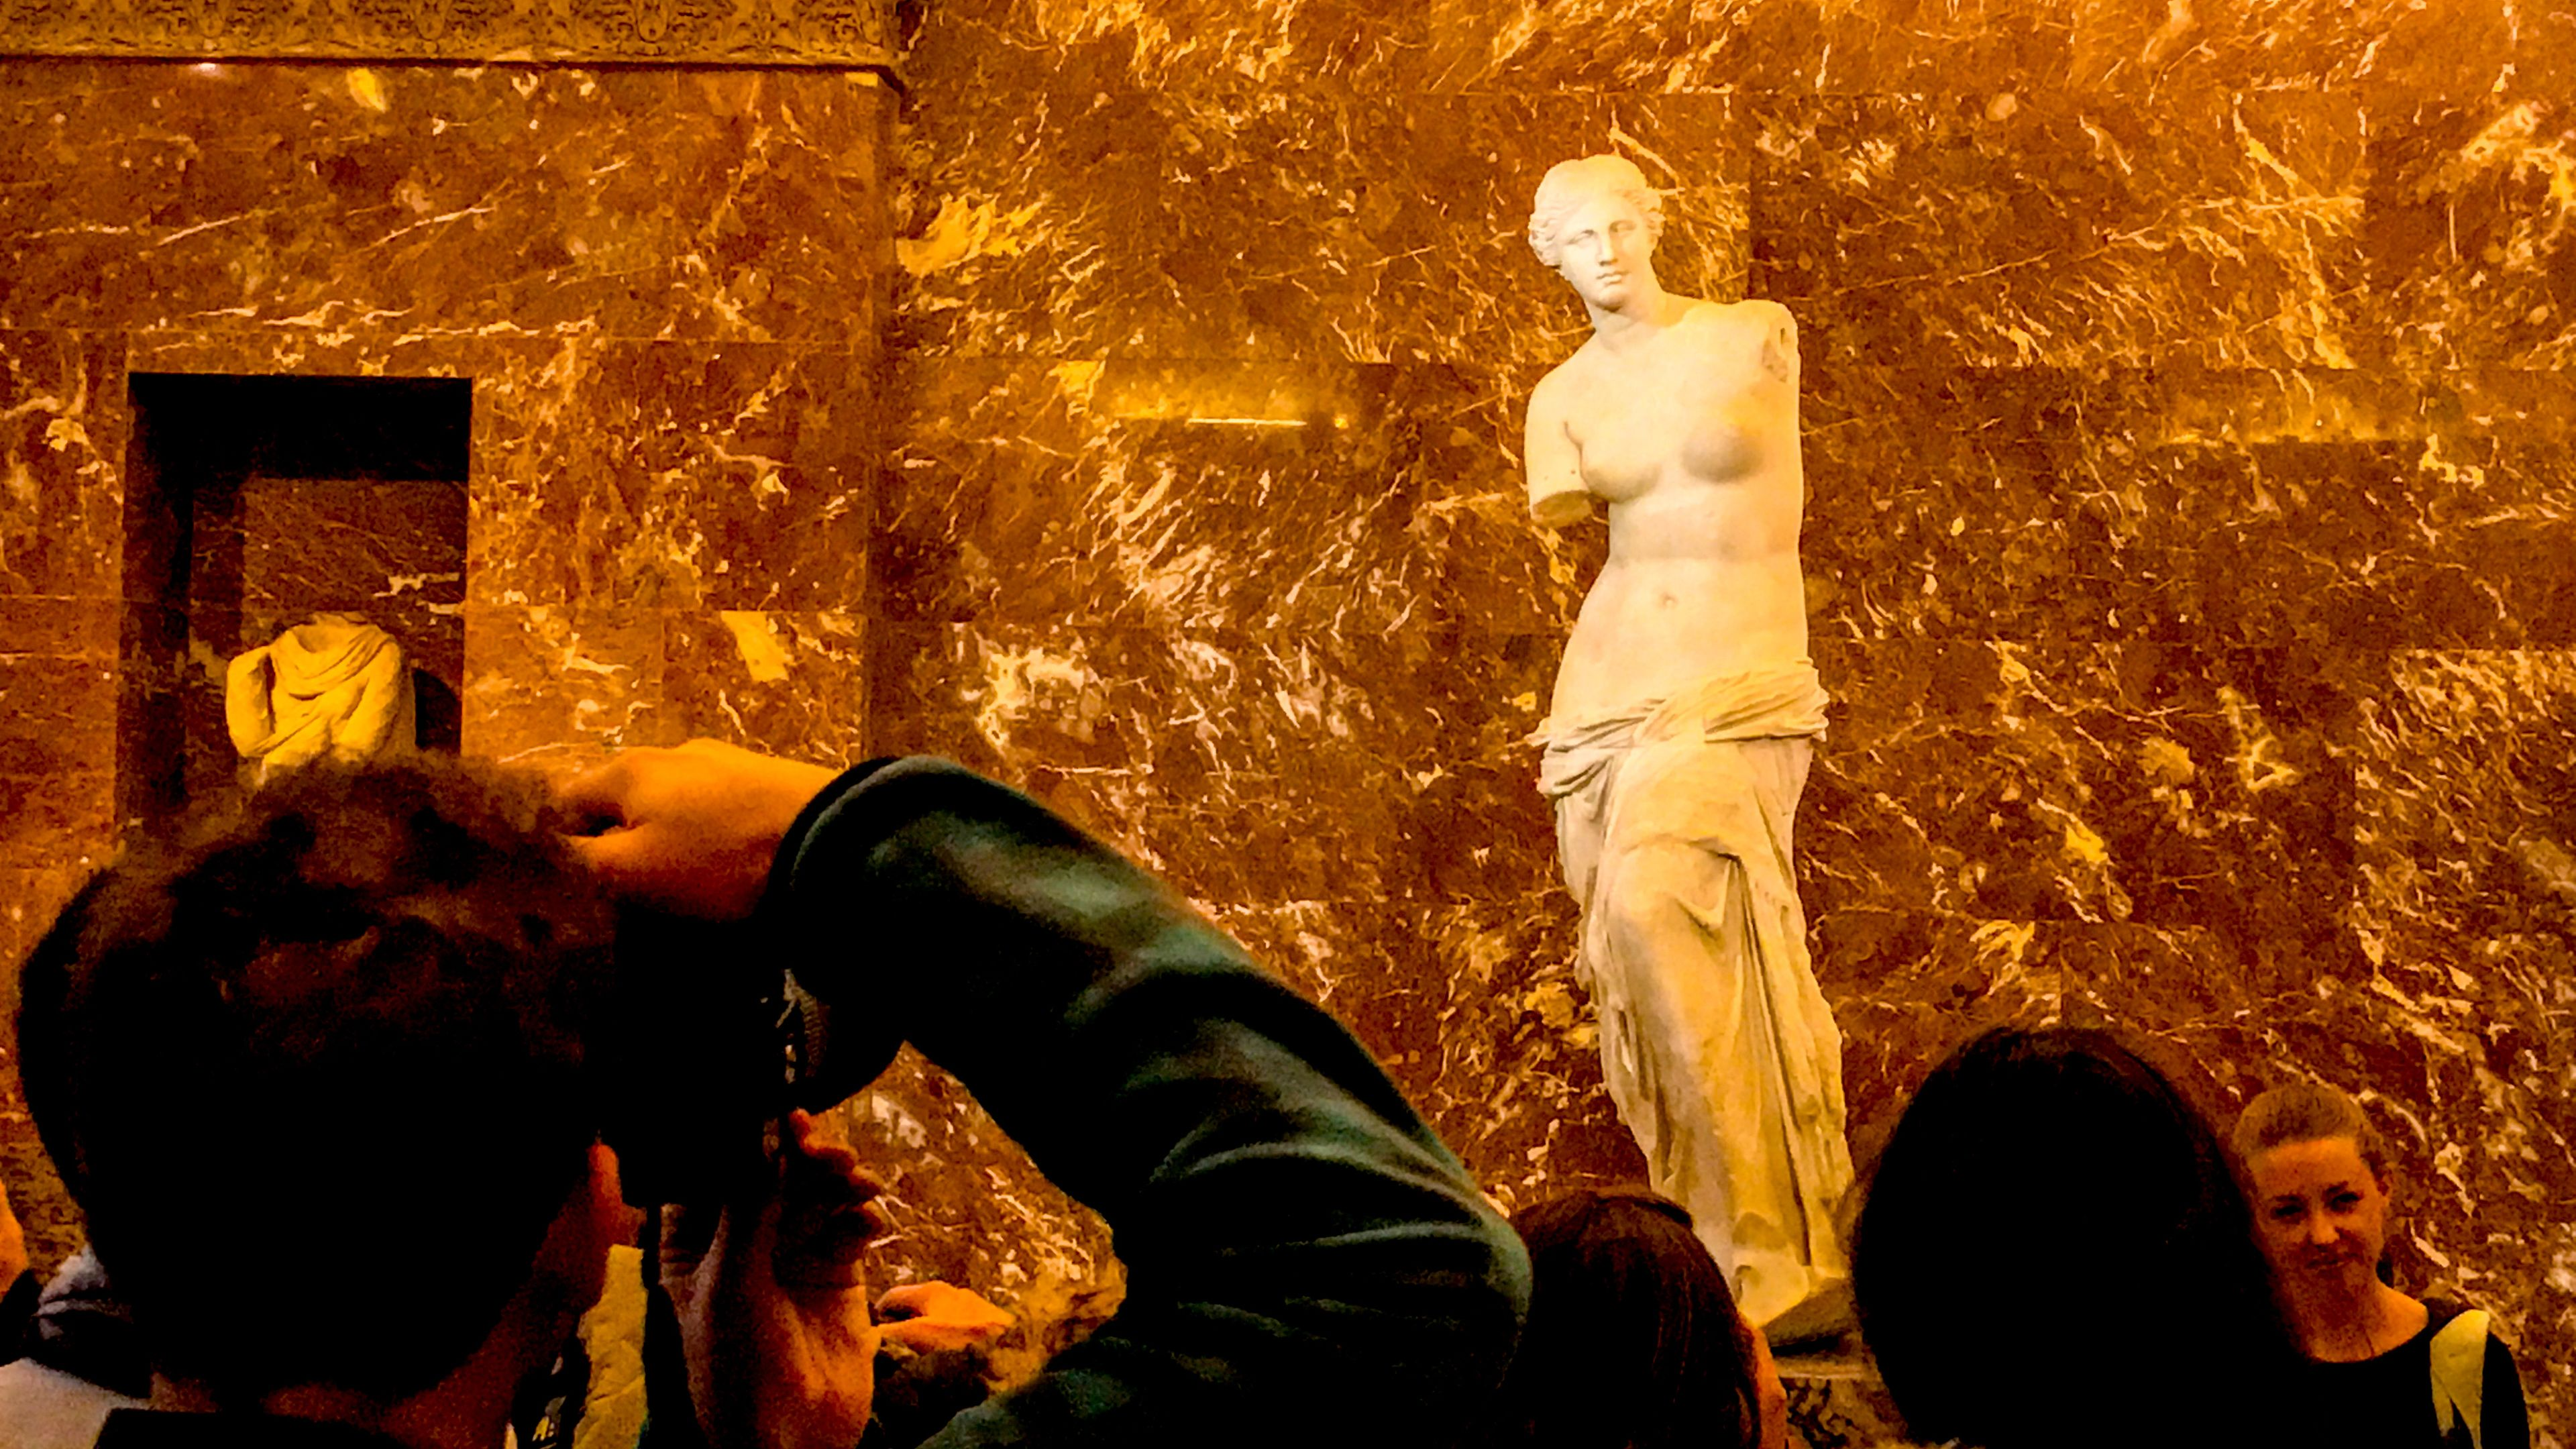 Venus Di Milo in the Louvre